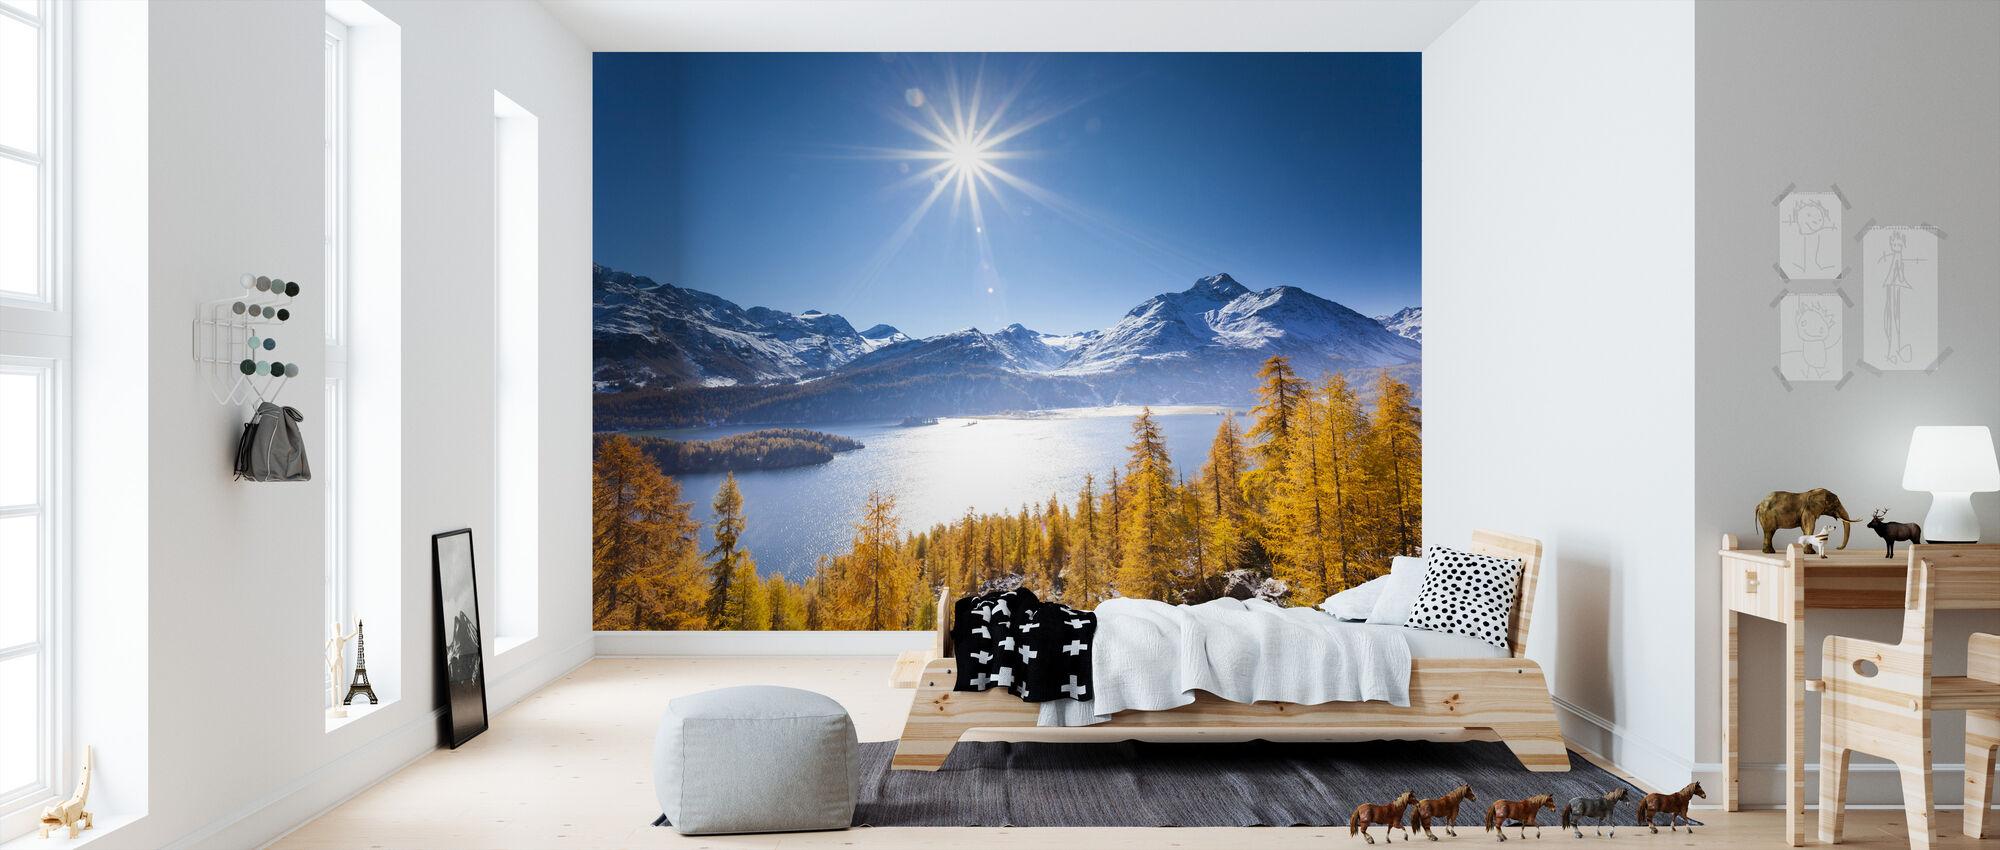 graubunden switzerland fototapete nach ma photowall. Black Bedroom Furniture Sets. Home Design Ideas